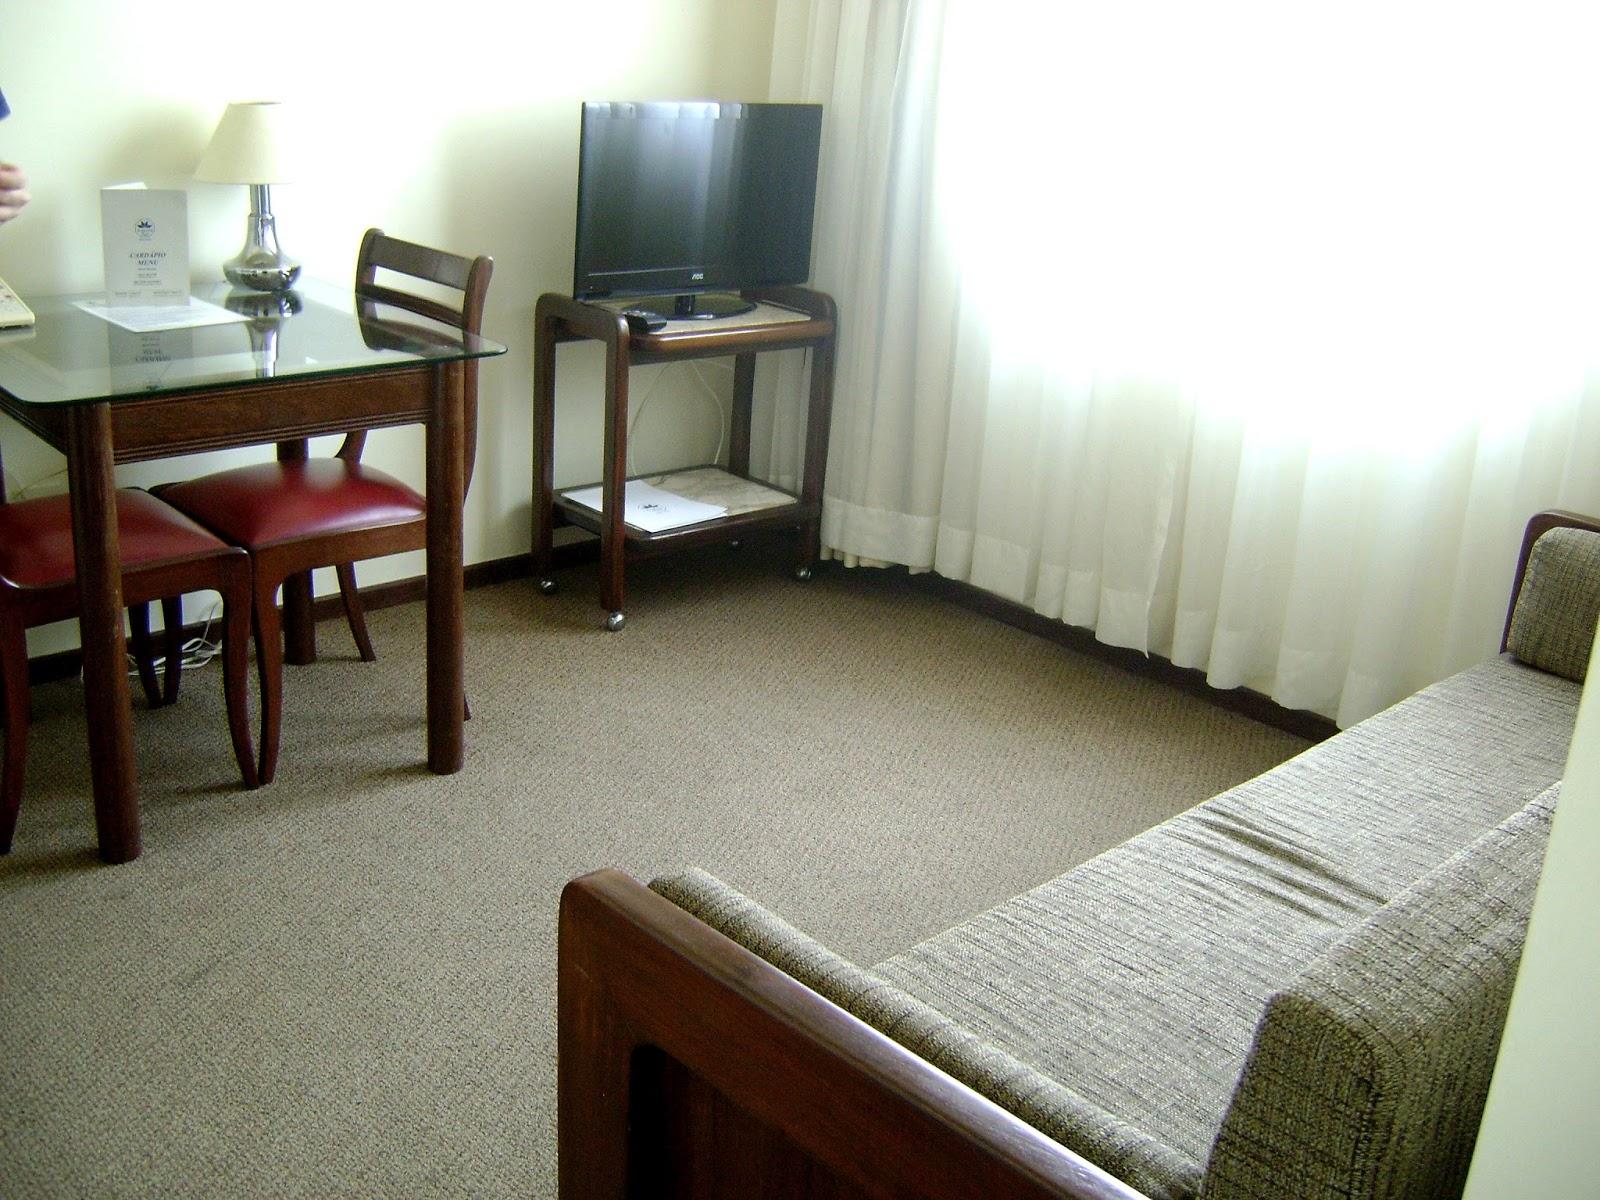 Augusta Park Hotel,Augusta Park Hotel,hotel bom e barato em sp, hotel bom e barato em sp